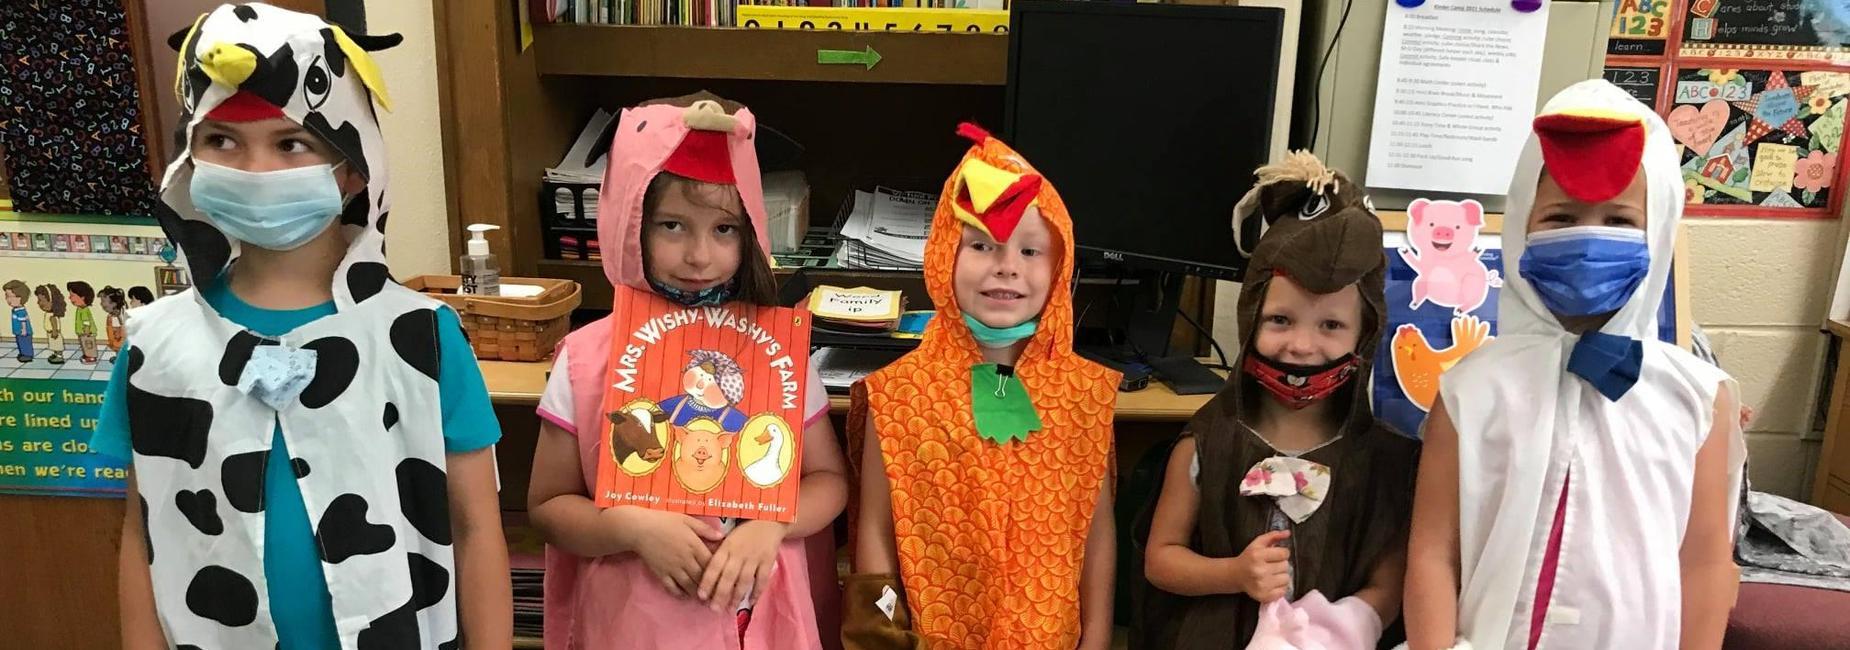 Sugar Grove Elementary Students dressed as farm animals.